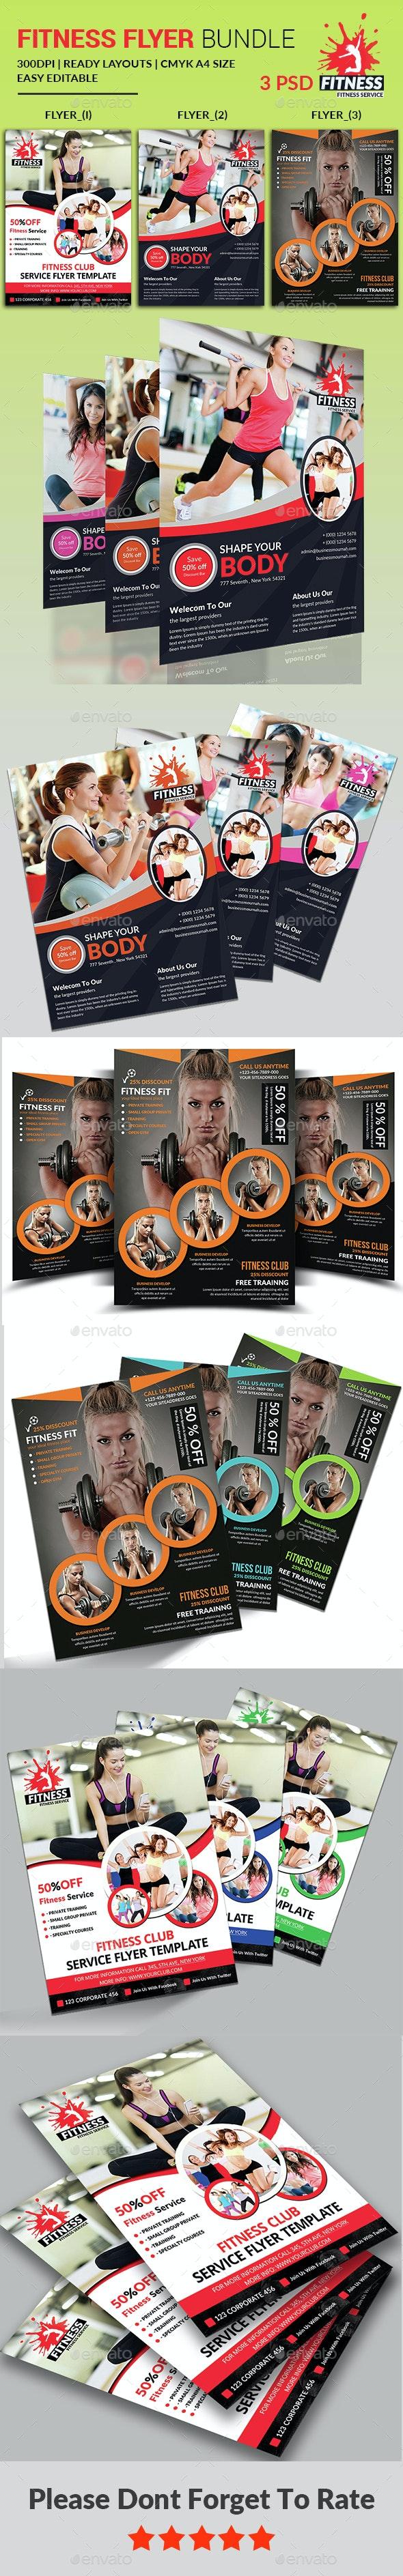 Fitness Flyer - Gym Flyer Bundle - Corporate Flyers